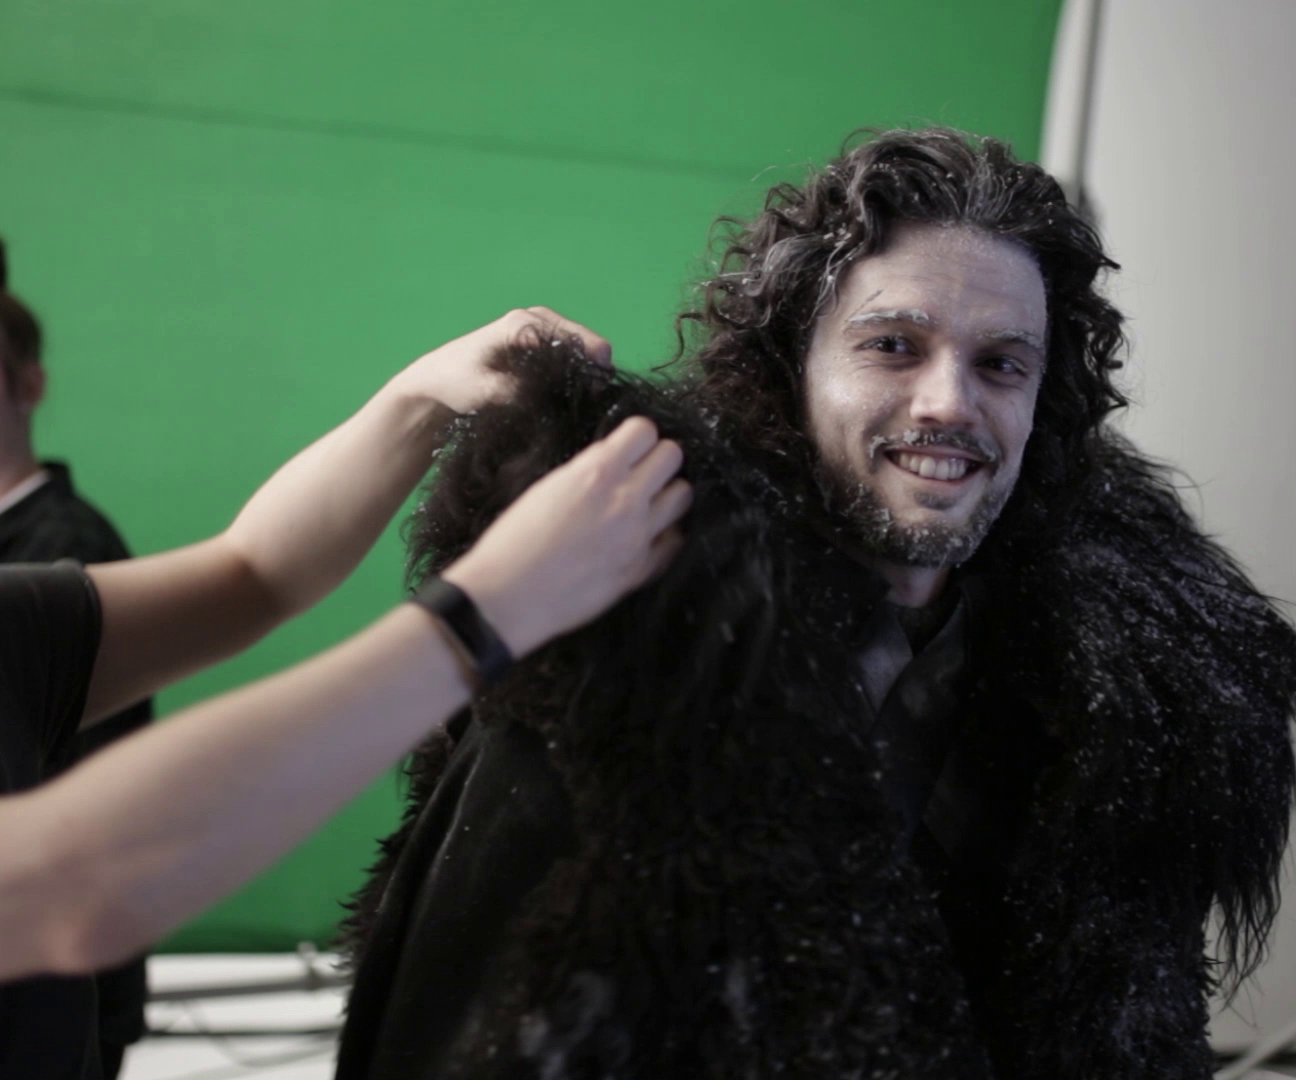 badenova Extrawärme VFX Breakdown - John Schnee vor Greenscreen